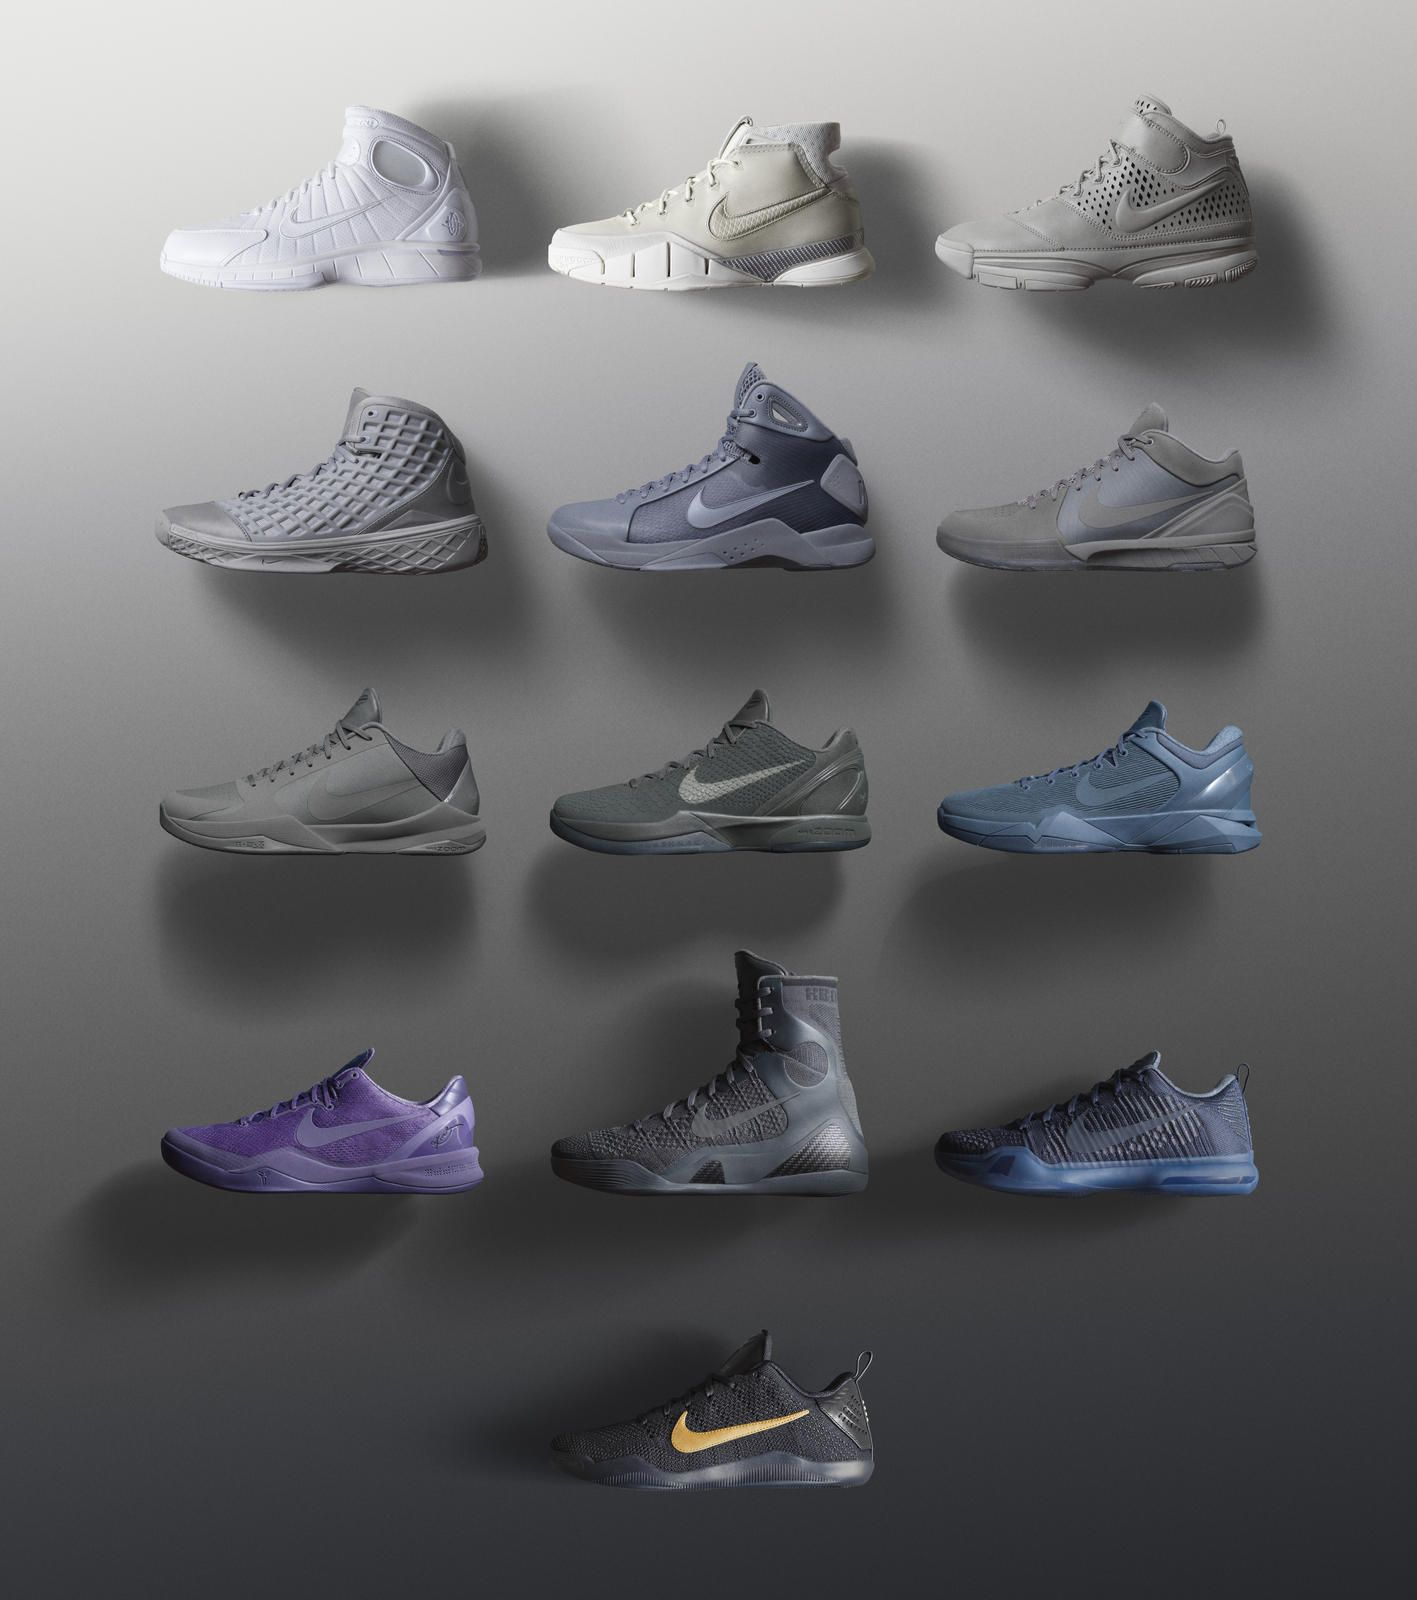 Nike Black Mamba pack. Perfect sendoff for the GOAT